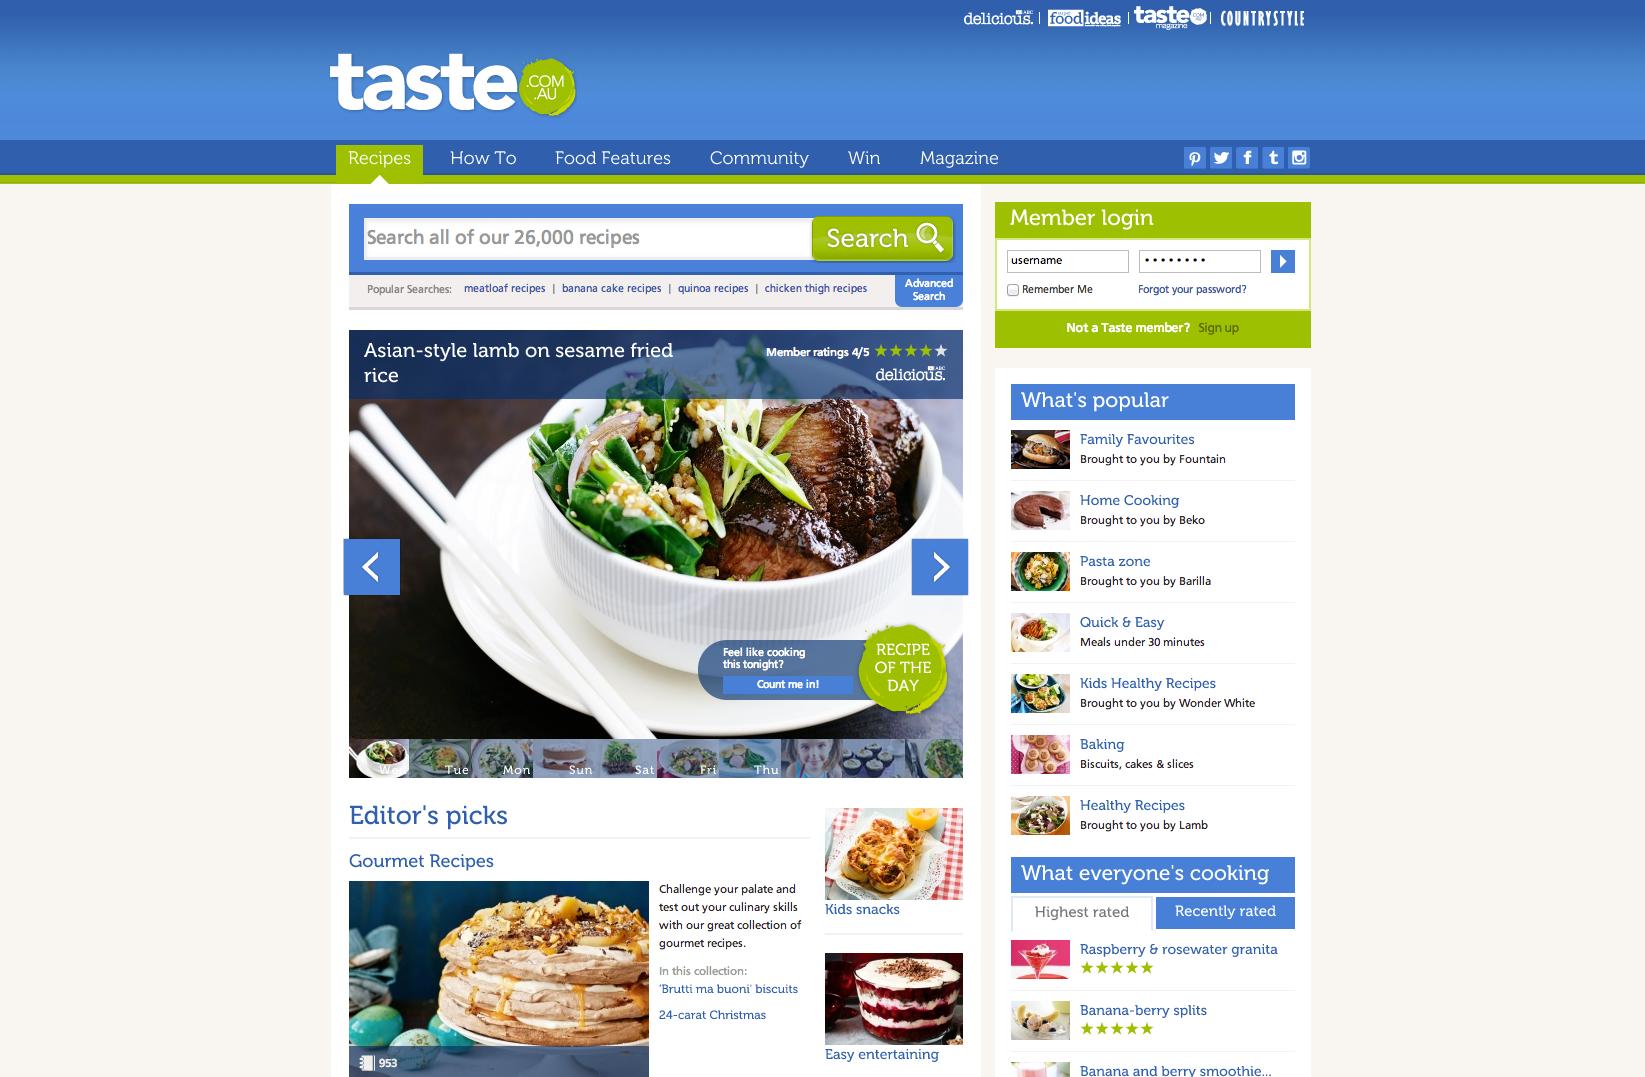 http://www.taste.com.au/